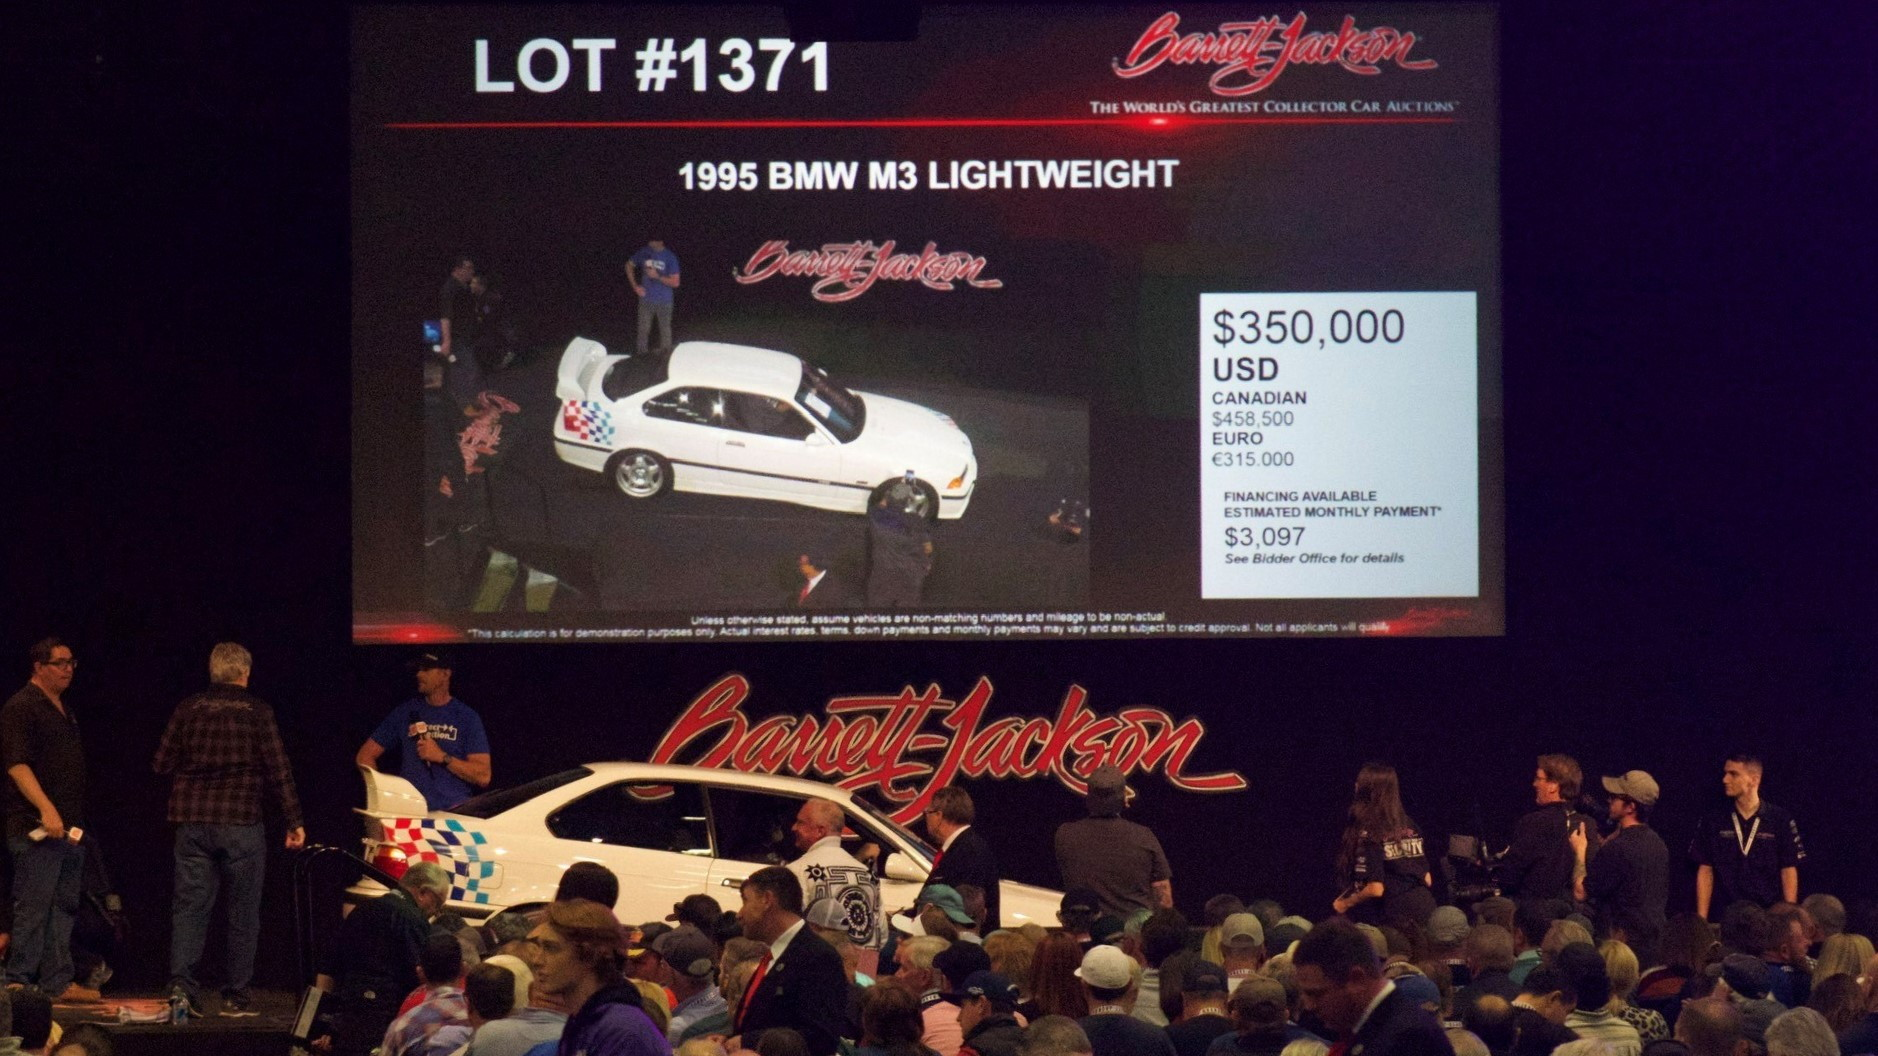 Paul Walker lightweight on Barrett-Jackson block hammer price at $350,000 | Jared Costello photo